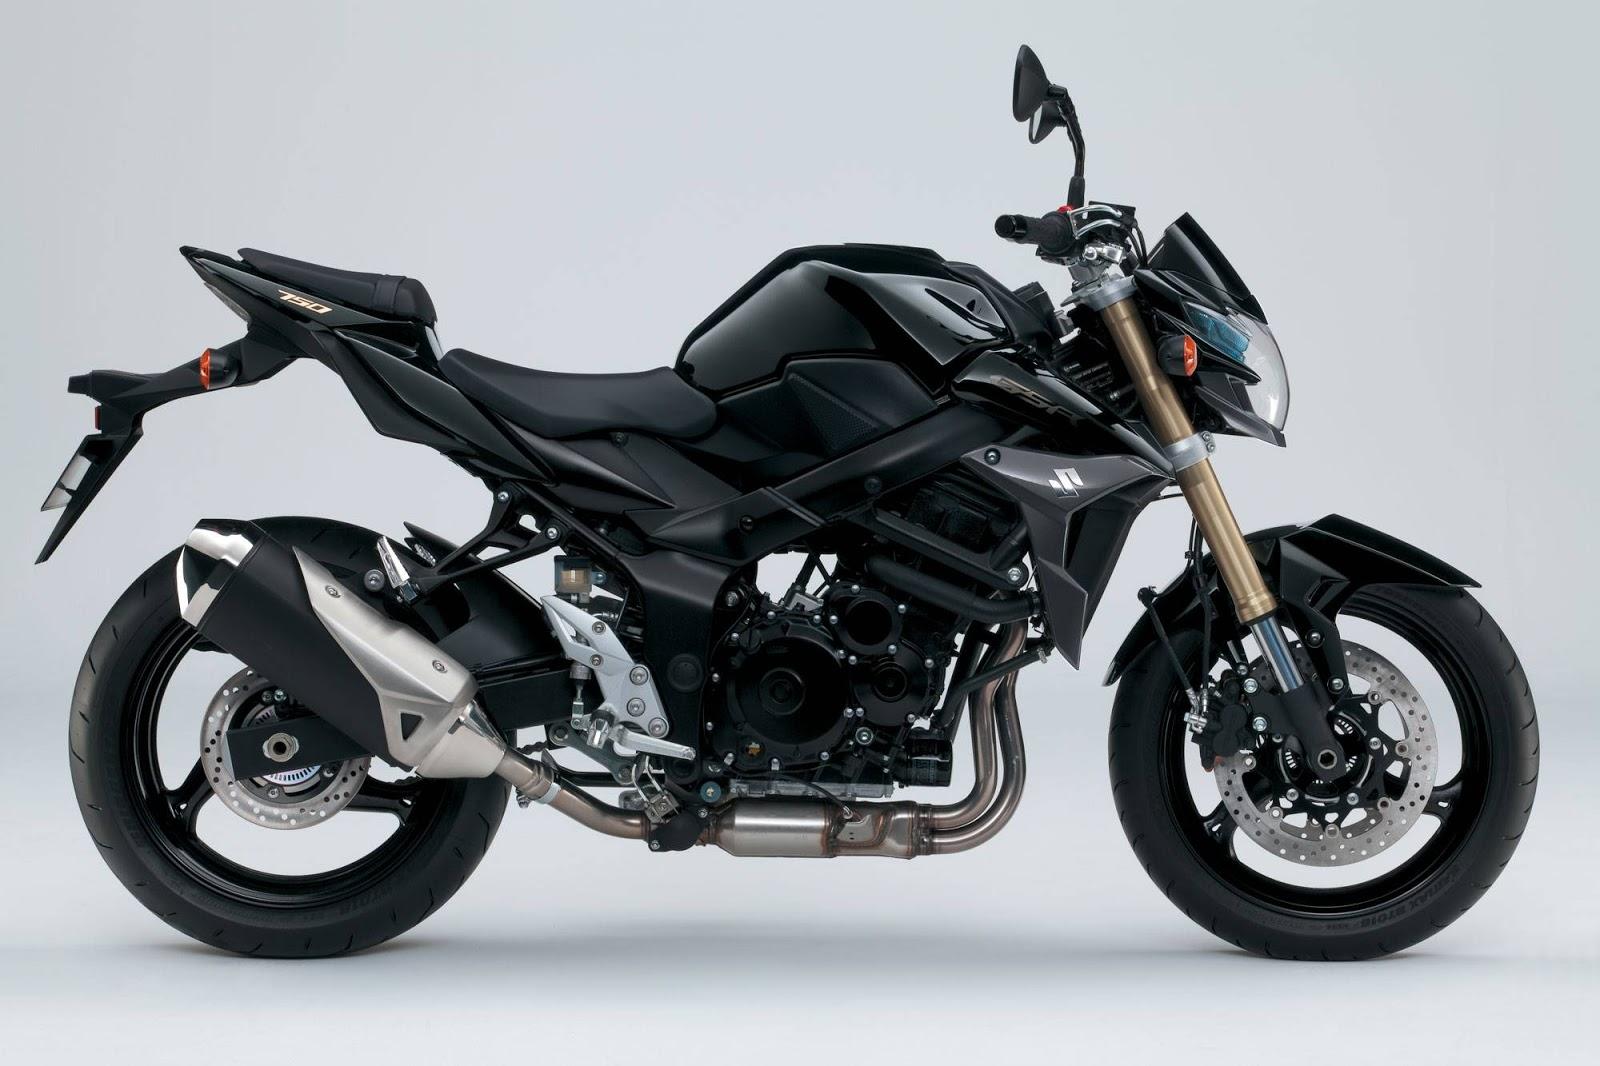 Keunggulan Motor Suzuki Inazuma 250R: title=